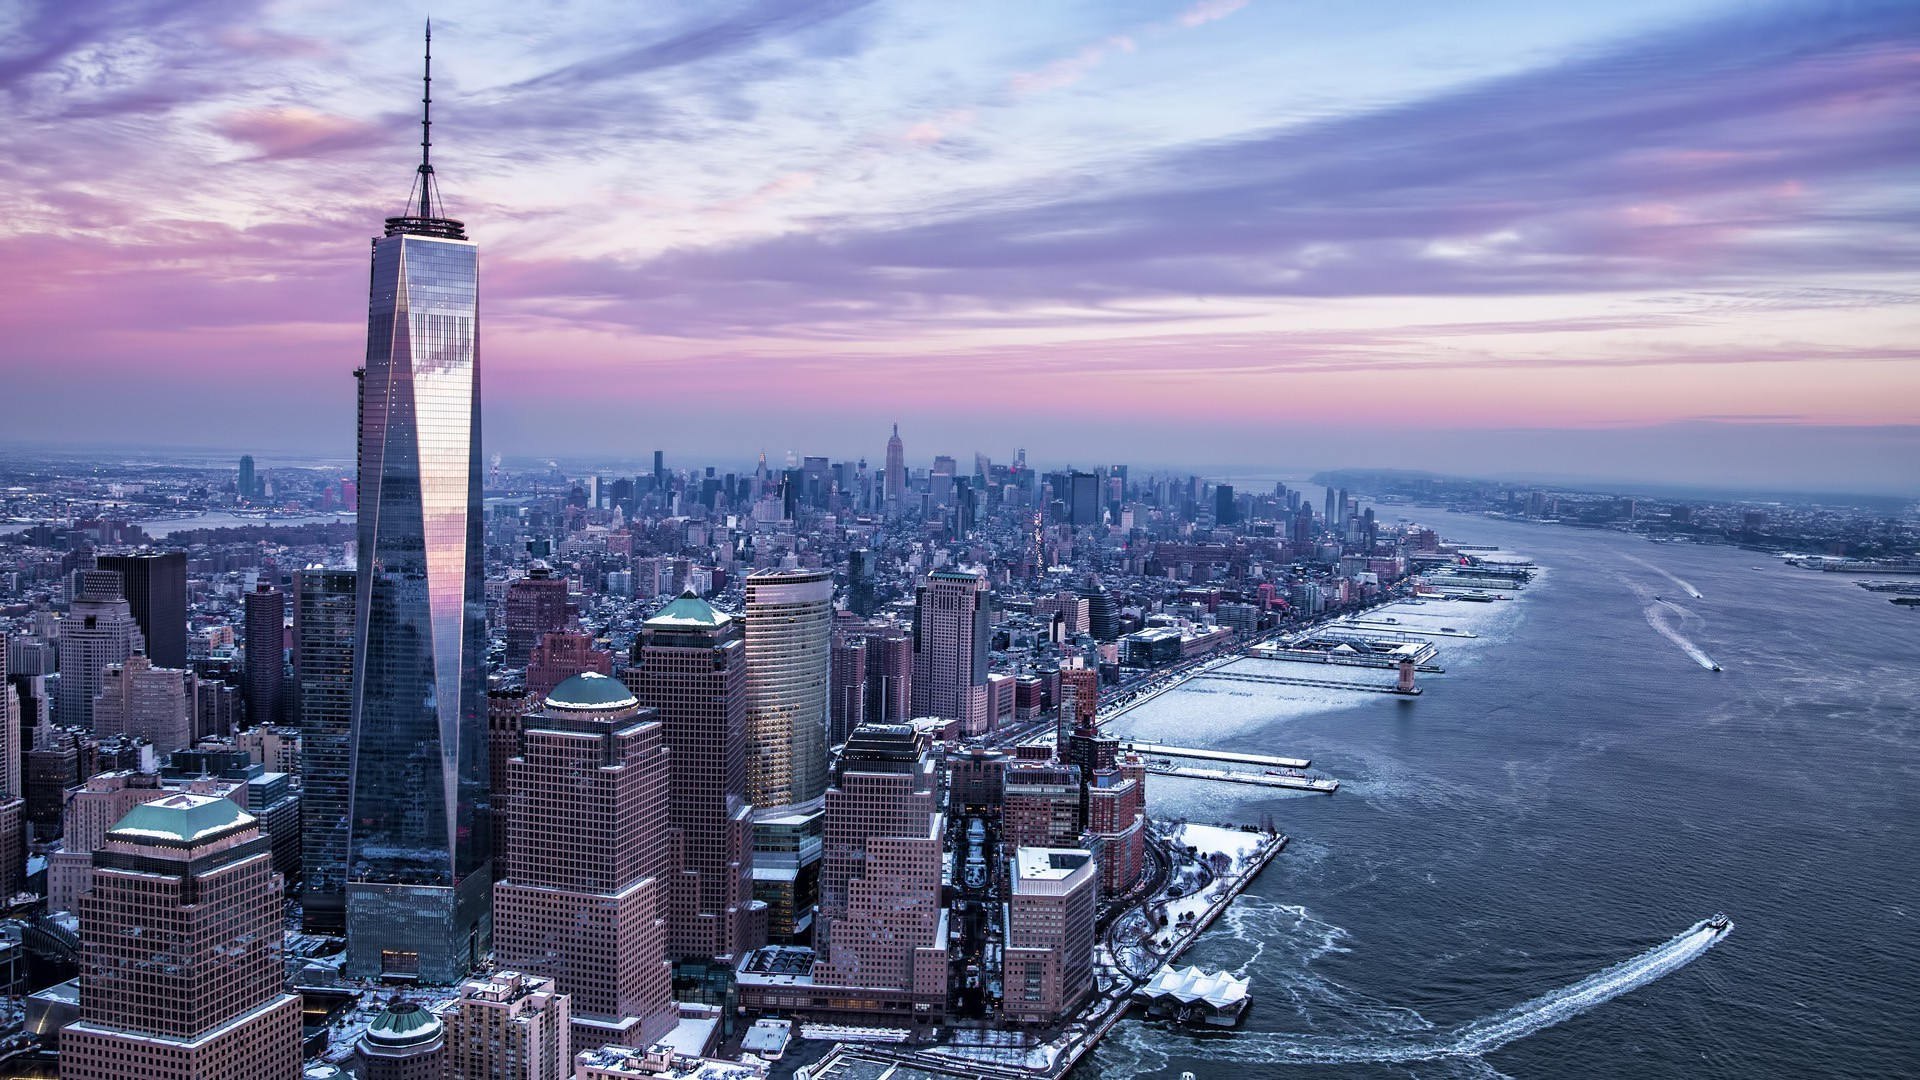 251837-New_York_City-city-USA-Freedom_Tower-Manhattan-Hudson_River-winter-river-One_World_Trade_Center.jpg